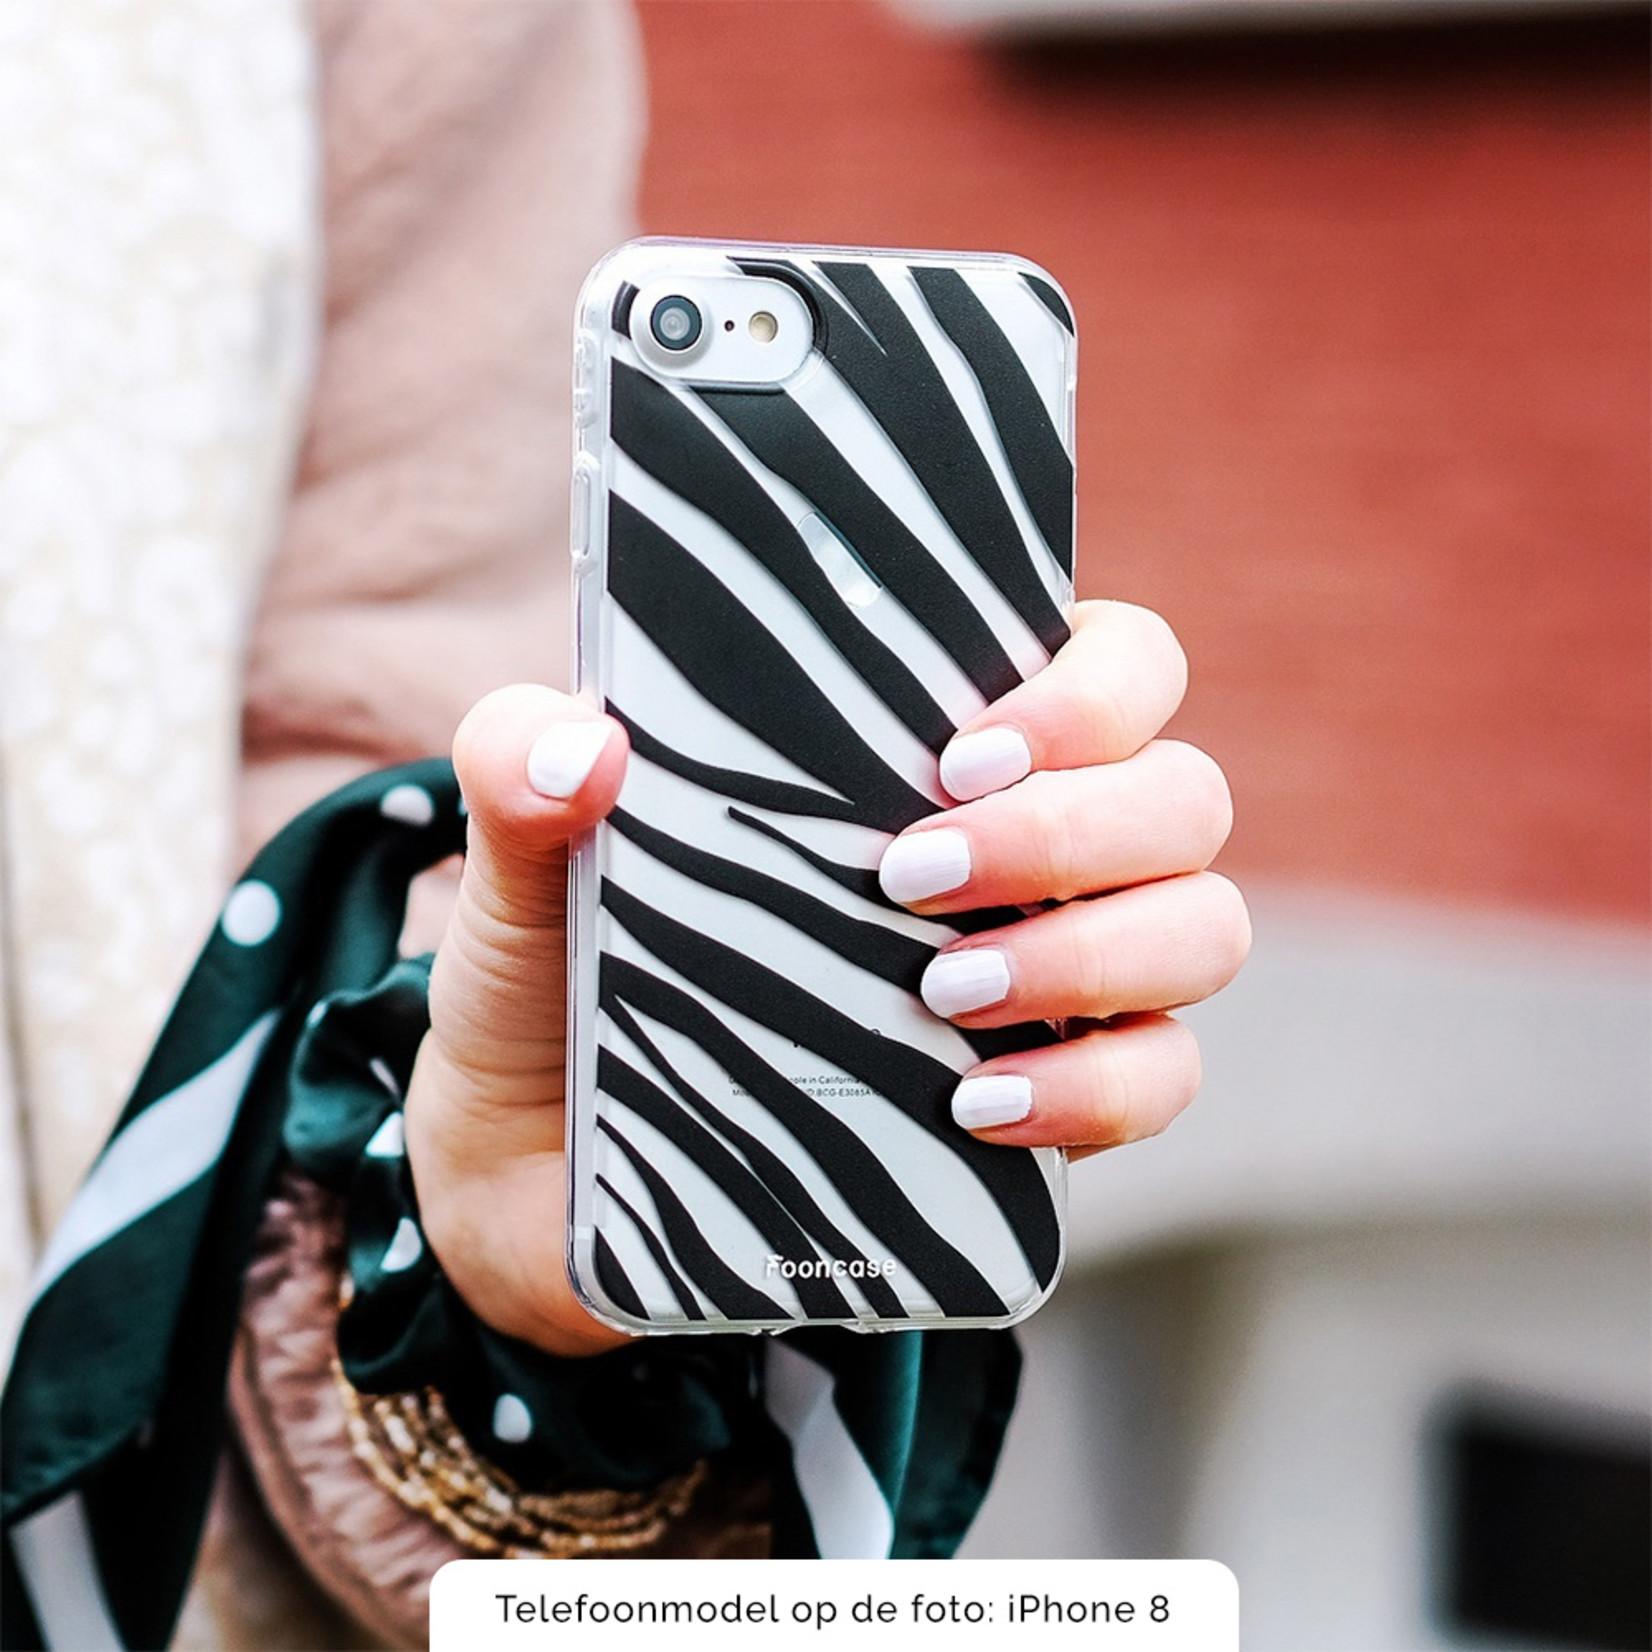 FOONCASE Huawei P8 Lite 2016 hoesje TPU Soft Case - Back Cover - Zebra print